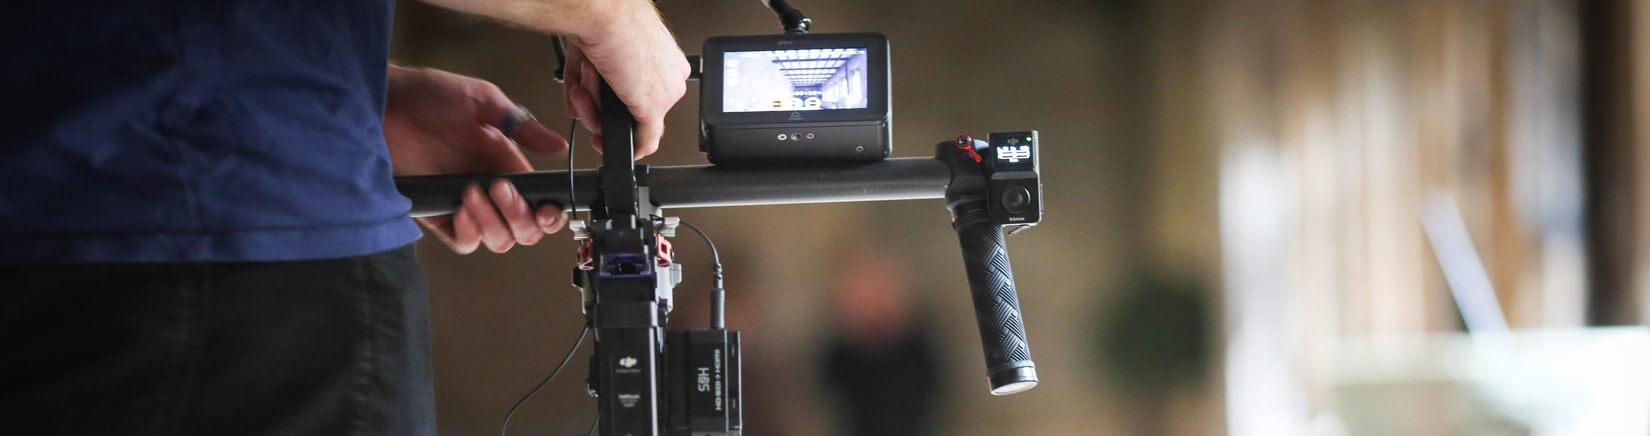 Zeddy productions - Nottingham based video agency